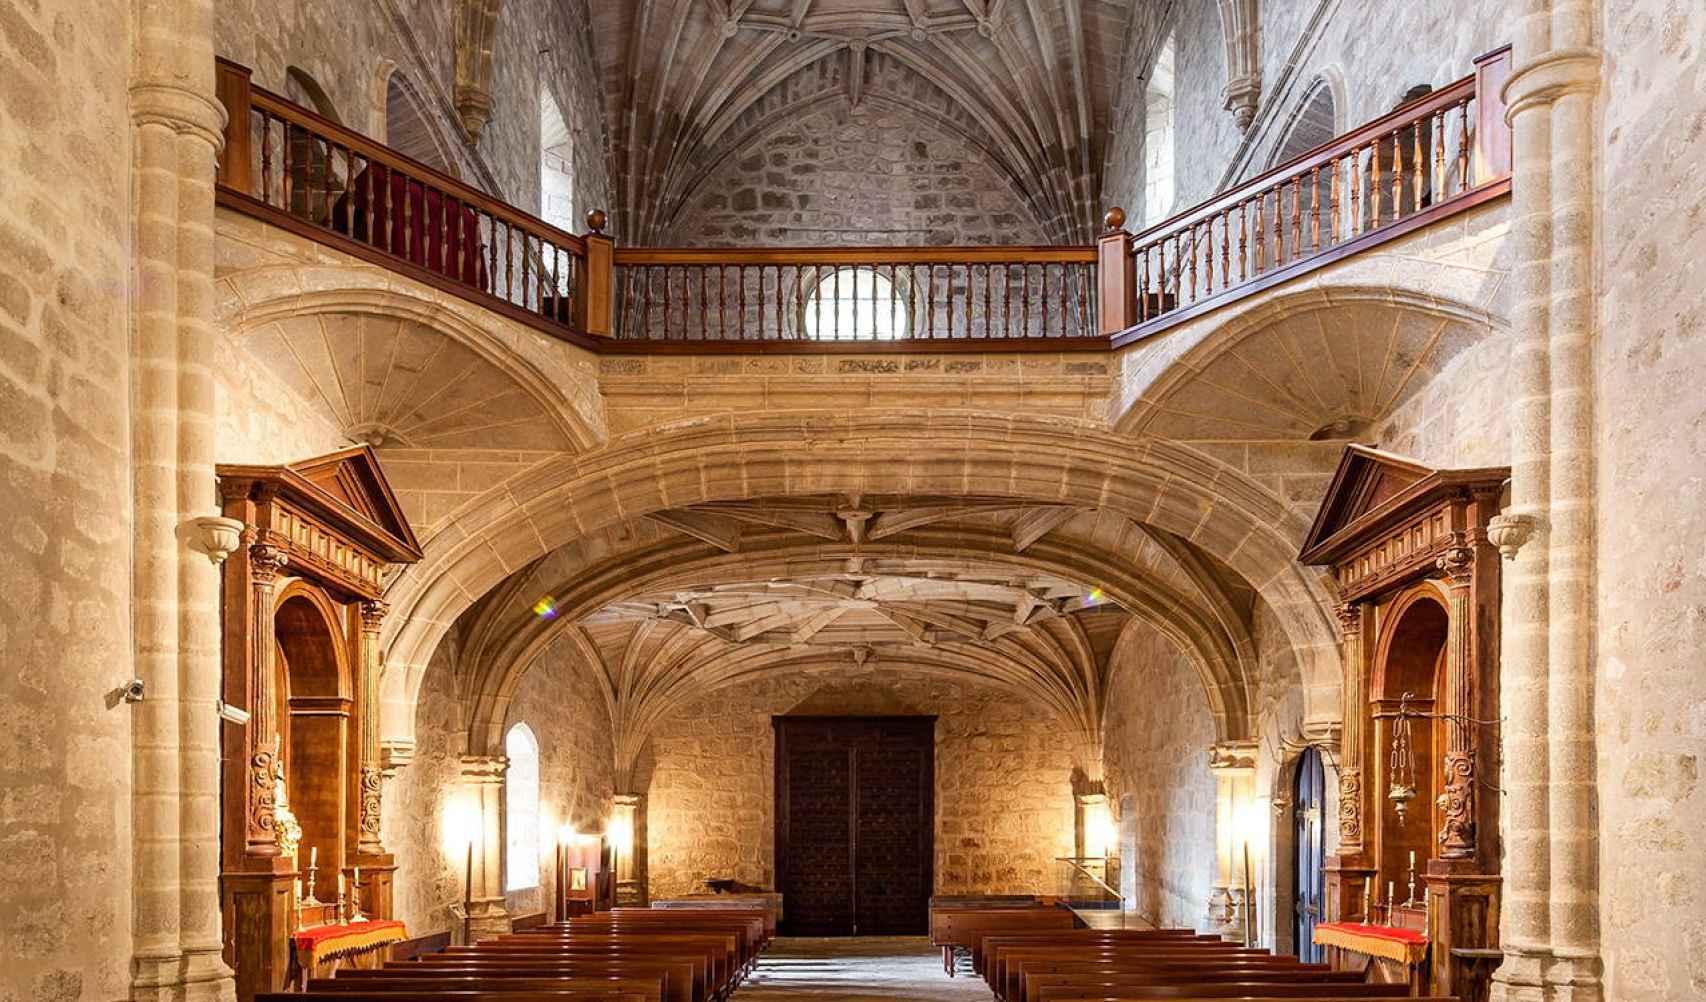 Interior de la iglesia del monasterio de Yuste.